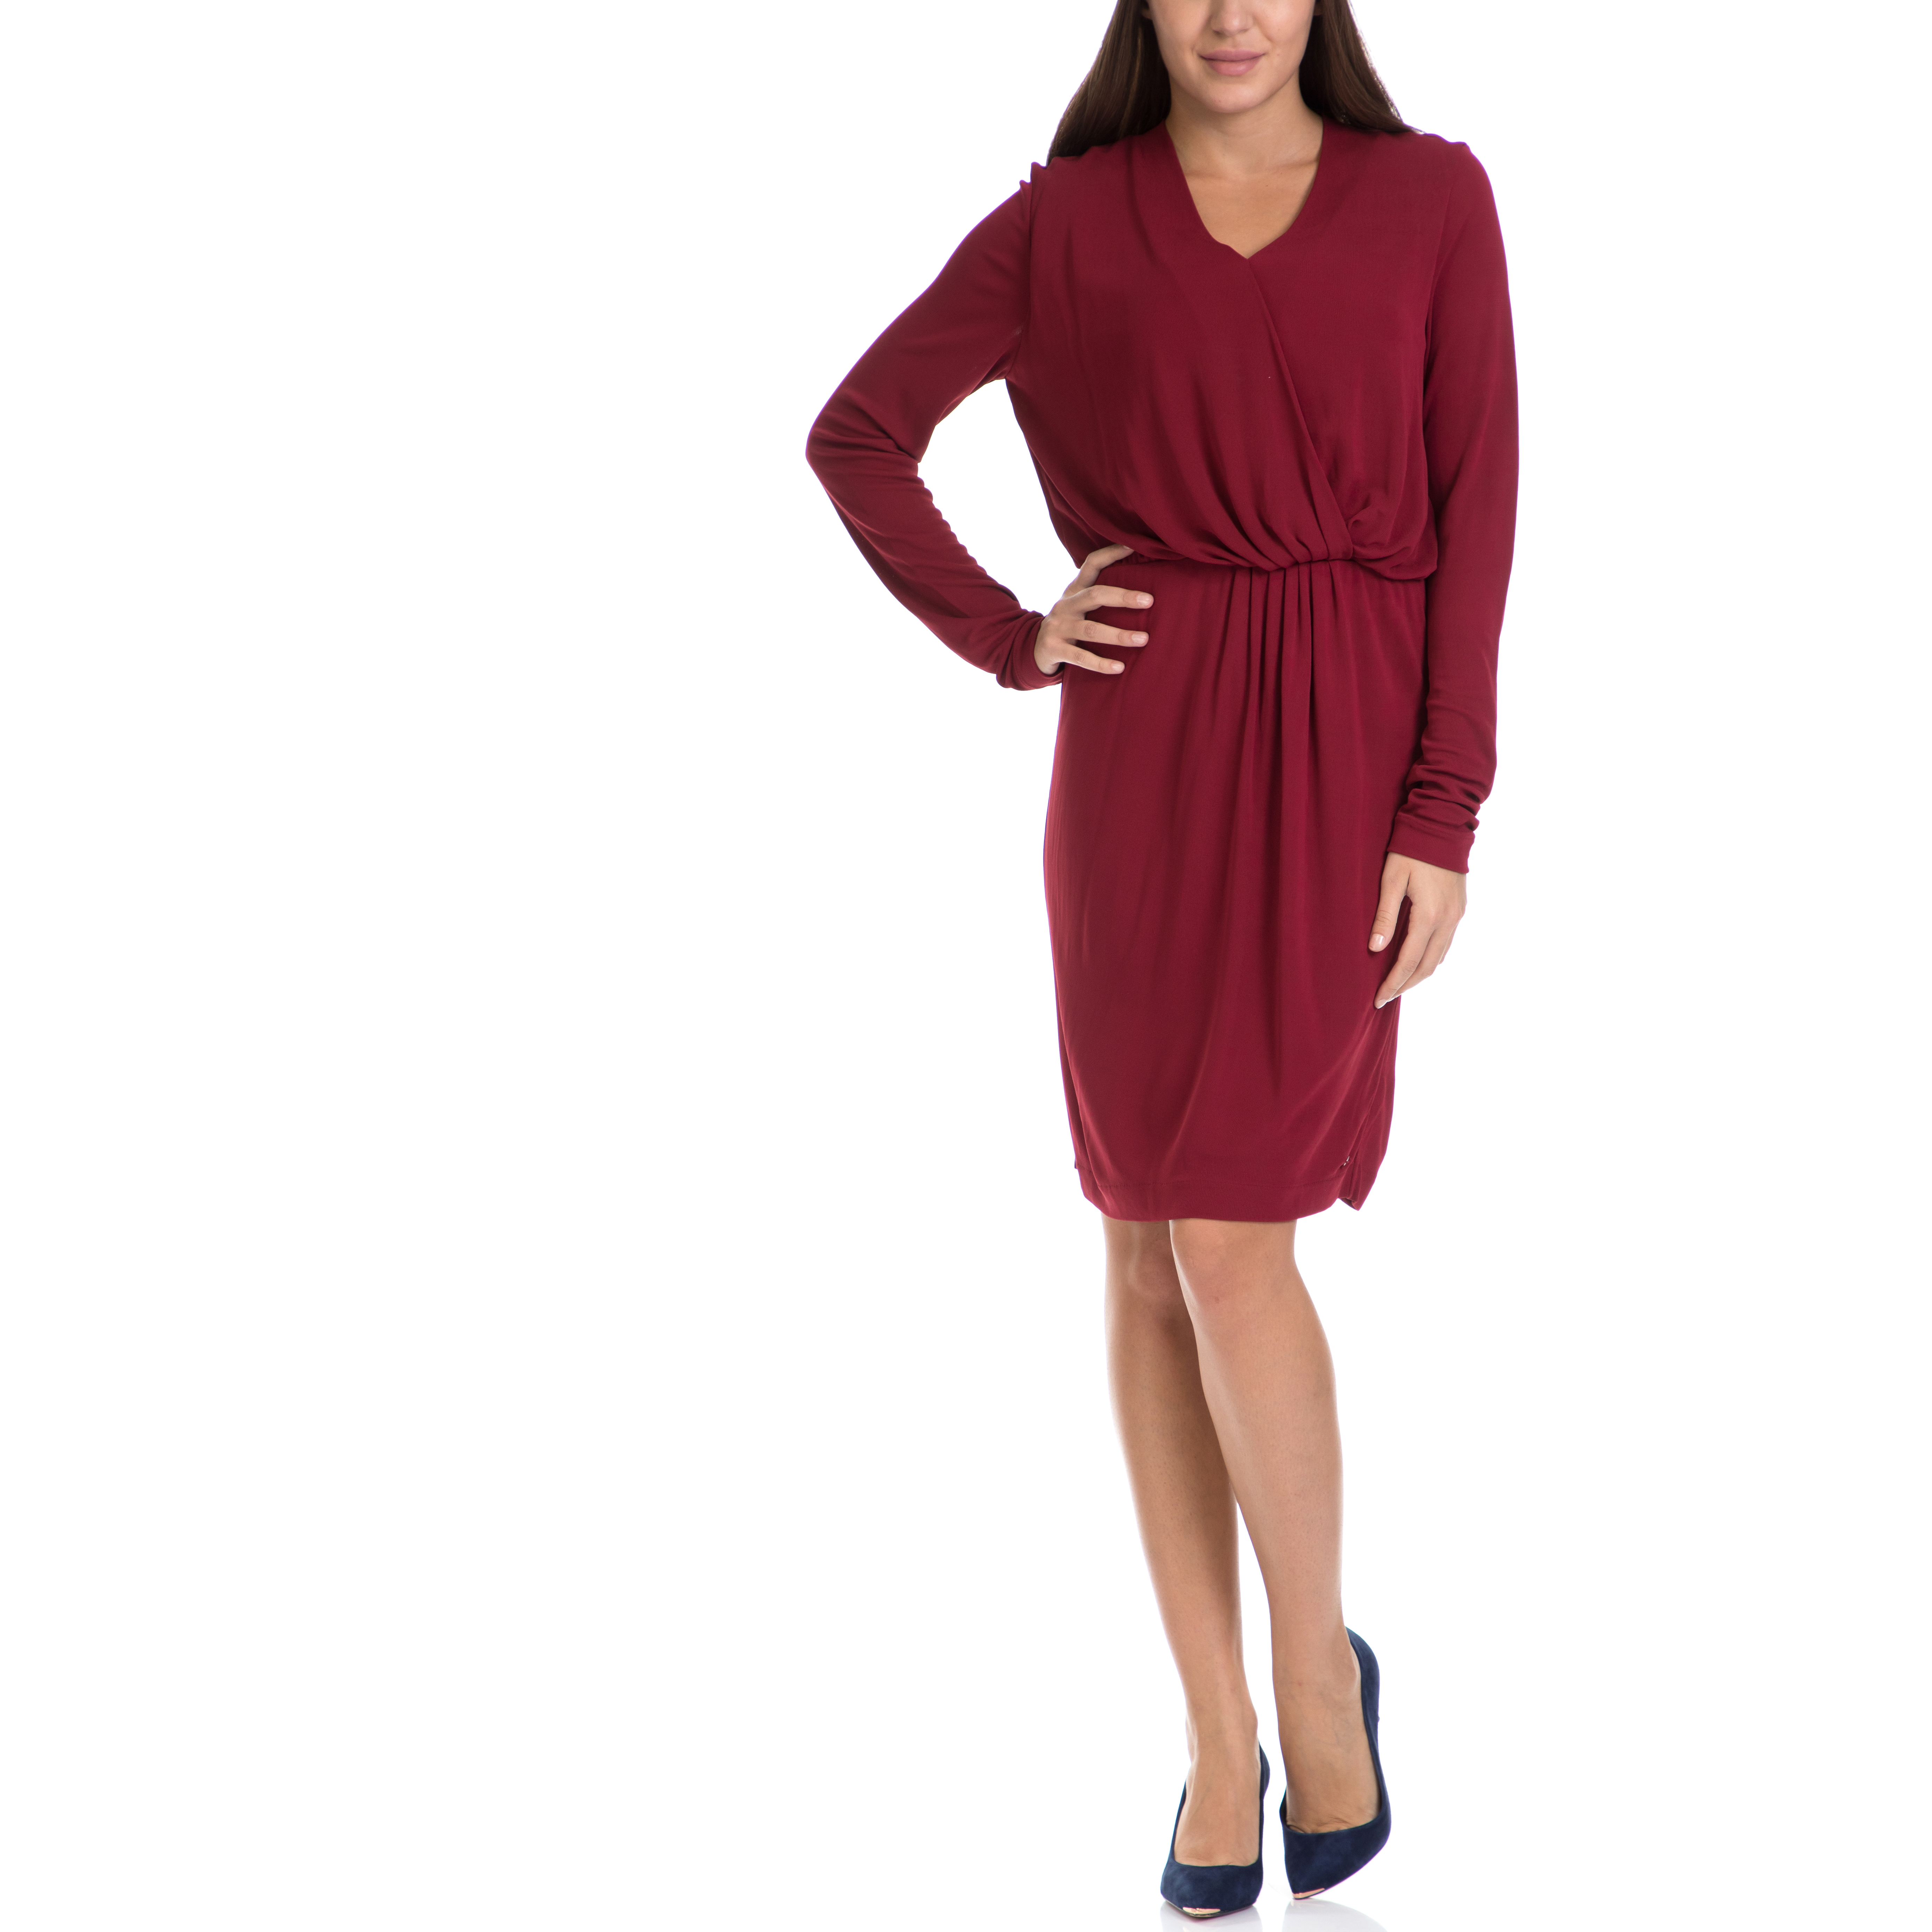 TOMMY HILFIGER - Γυναικείο φόρεμα JAHIA TOMMY HILFIGER κόκκινο γυναικεία ρούχα φορέματα μέχρι το γόνατο